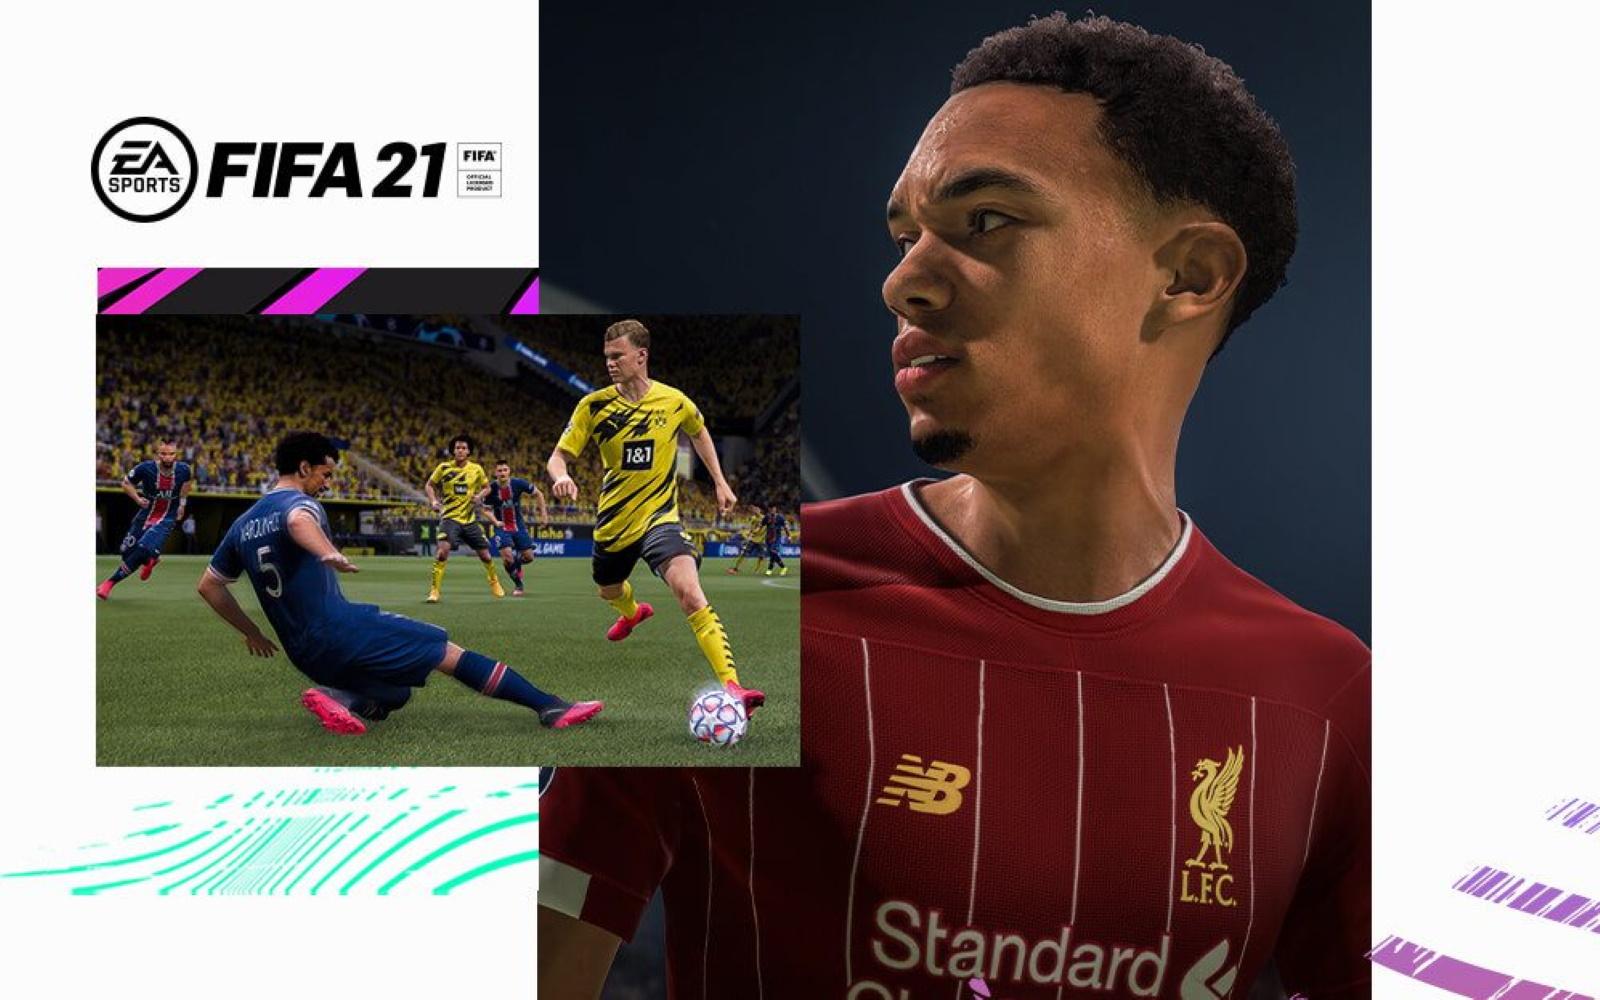 FIFA 21 Gameplay Trailer, Career Mode & FUT Info